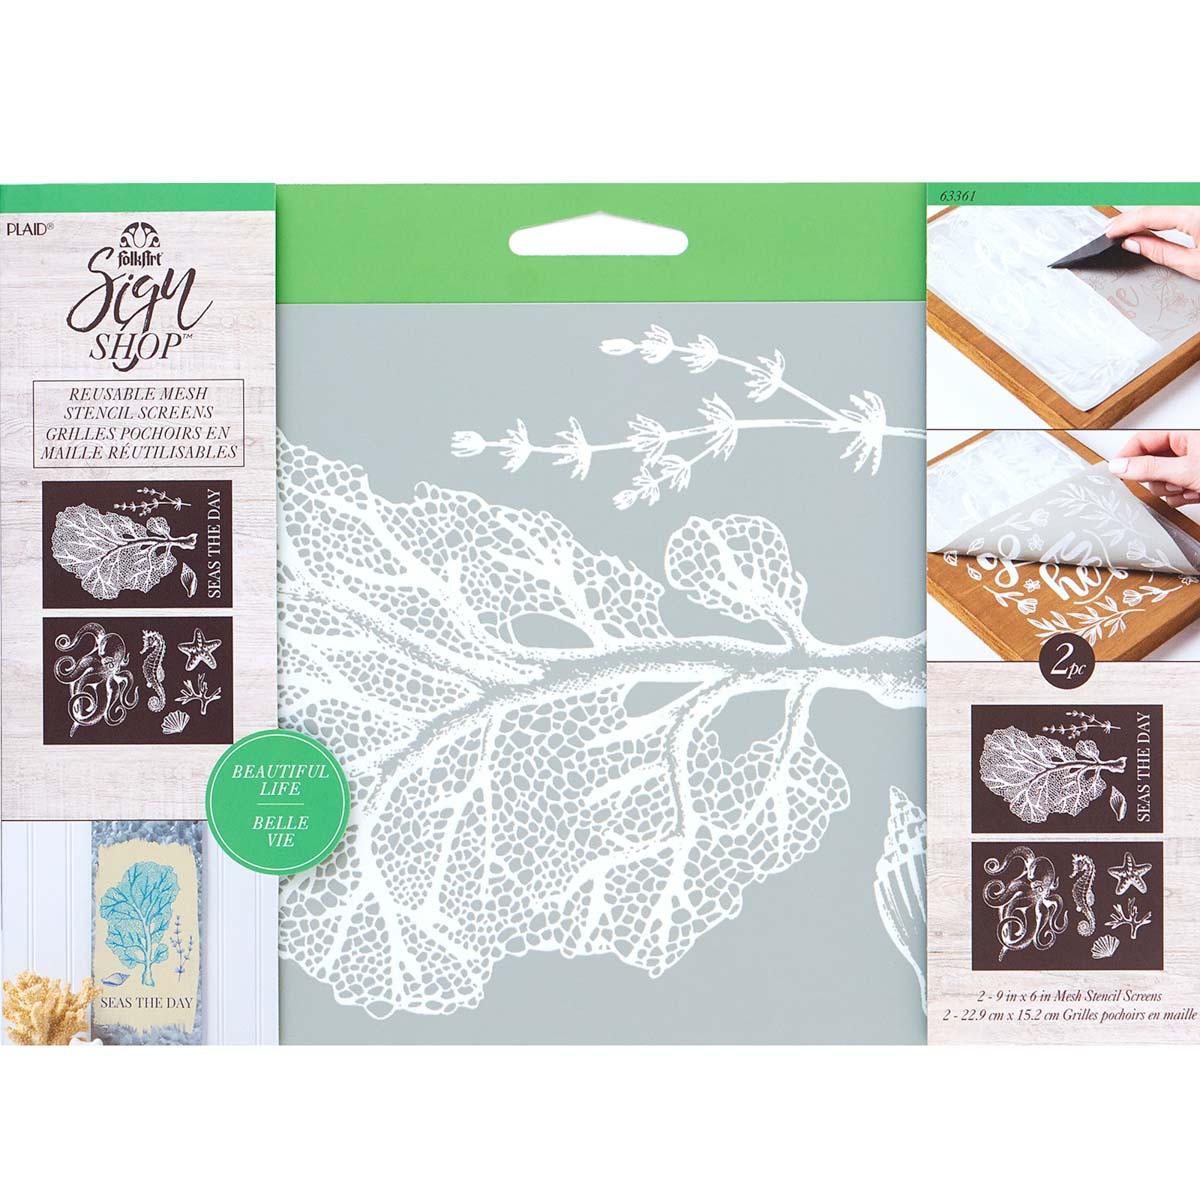 FolkArt ® Sign Shop™ Mesh Stencil - Sea Life, 2 pc. - 63361